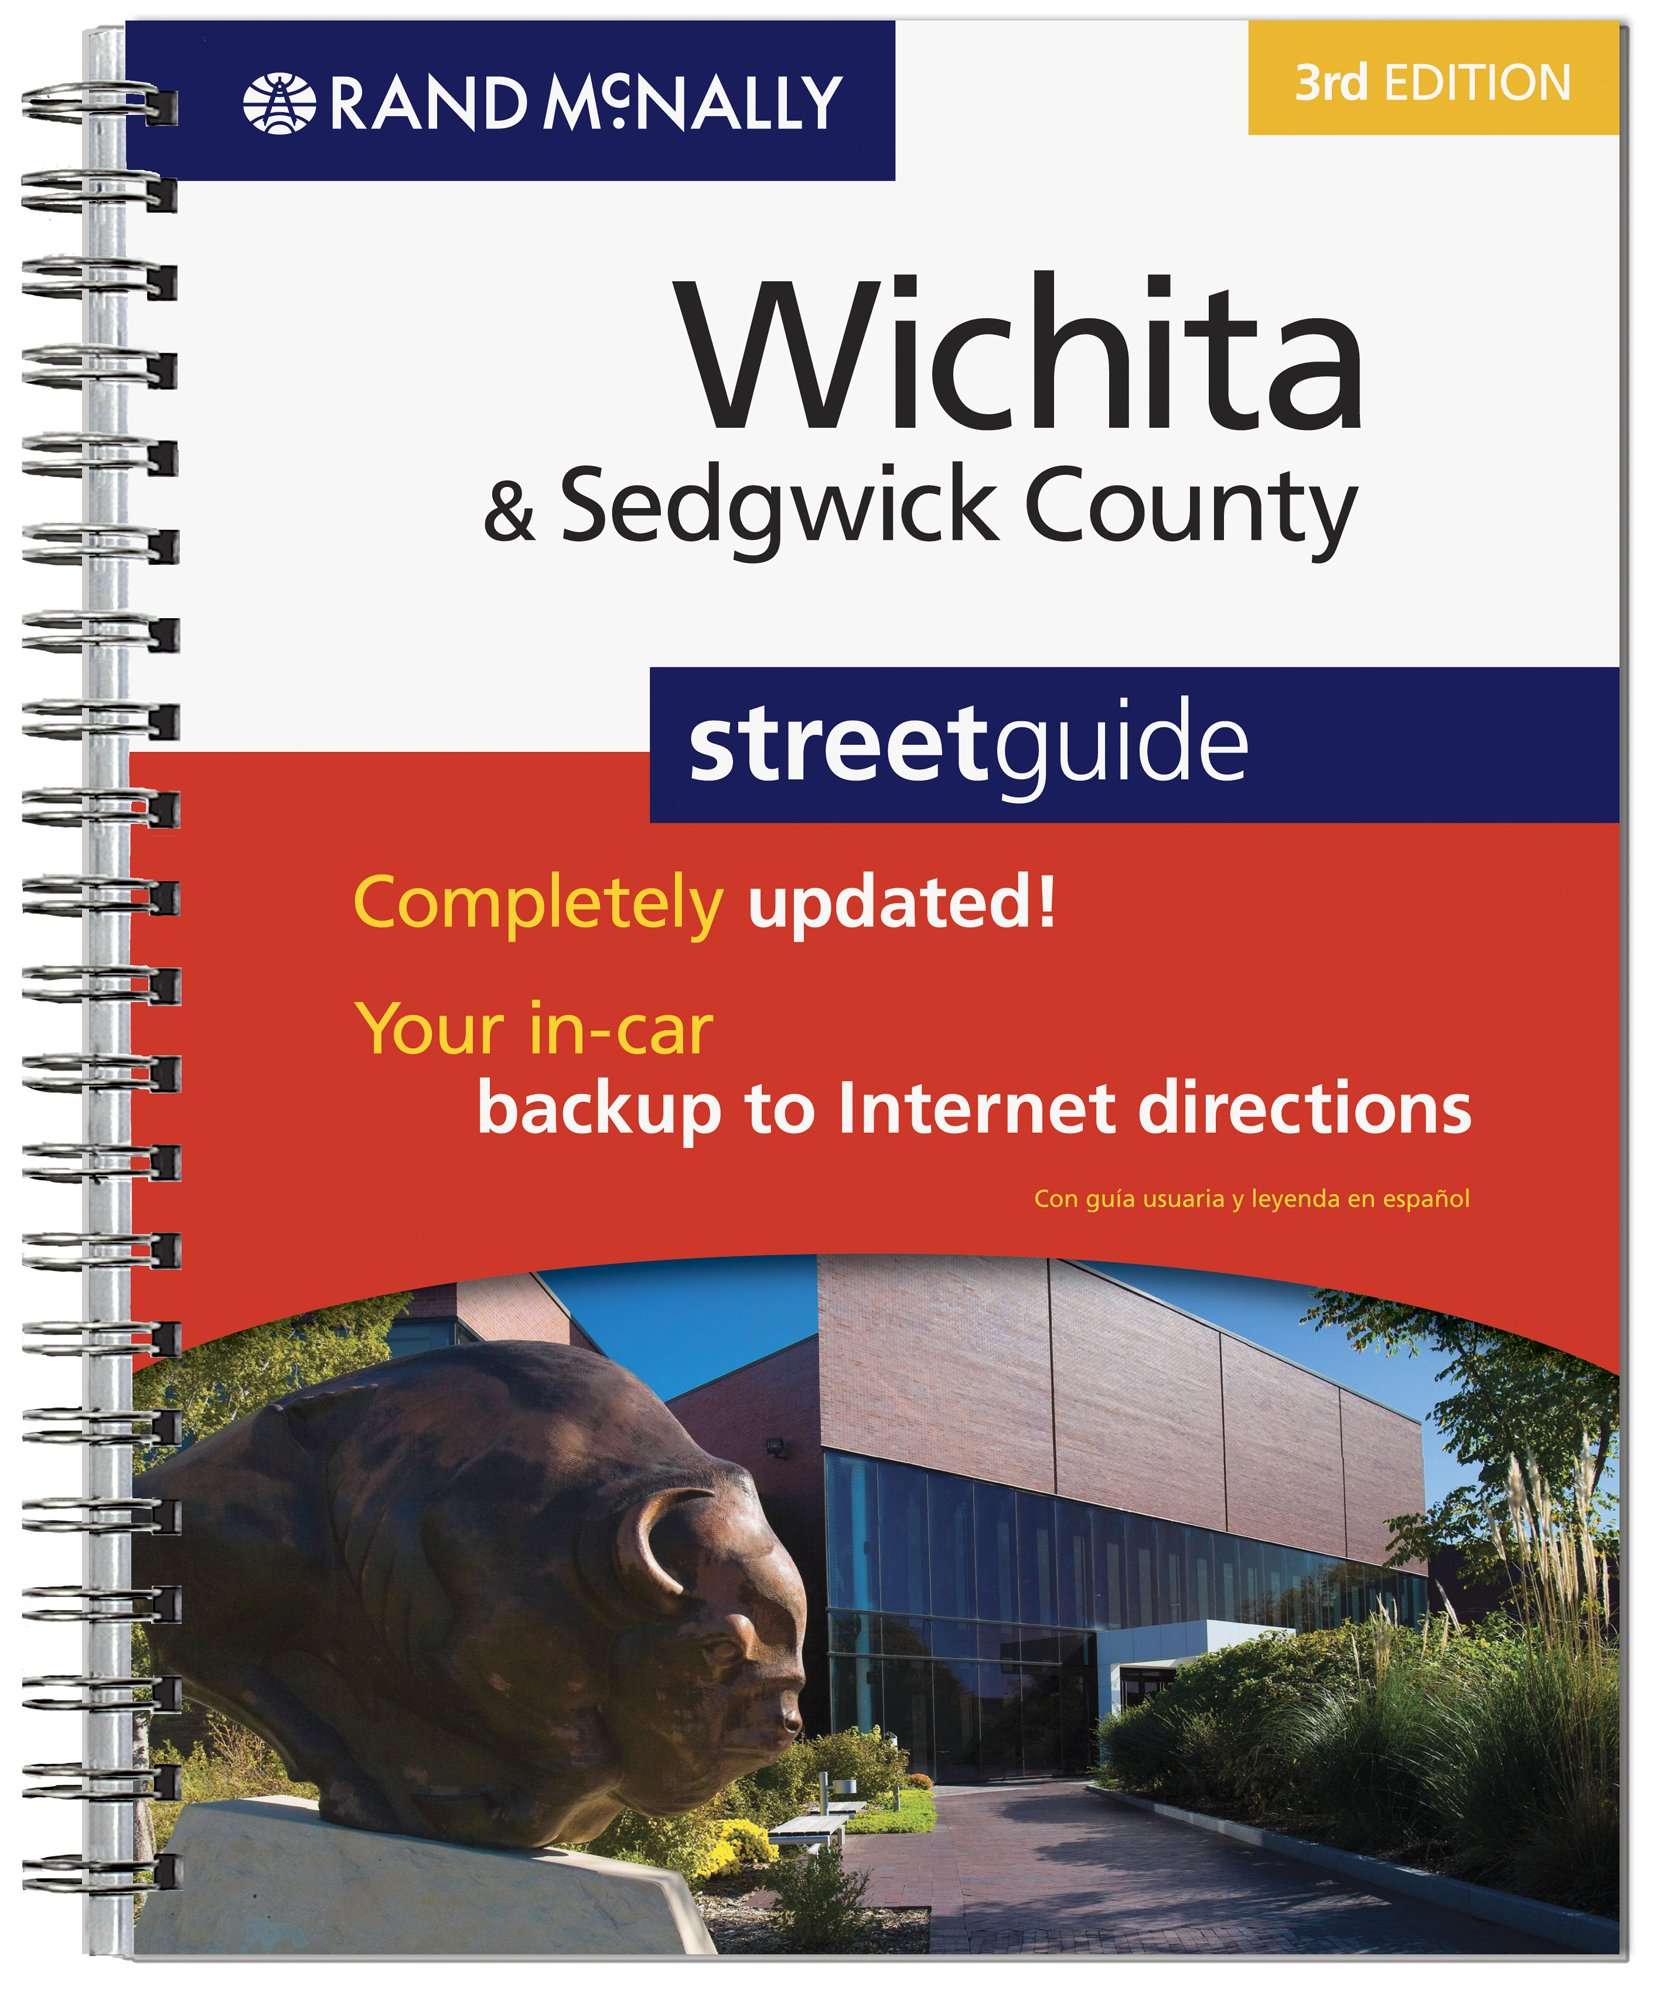 Rand McNally Wichita & Sedgewick County Streetguide (Rand McNally Wichita/Sedgwick County Street Guide) ebook